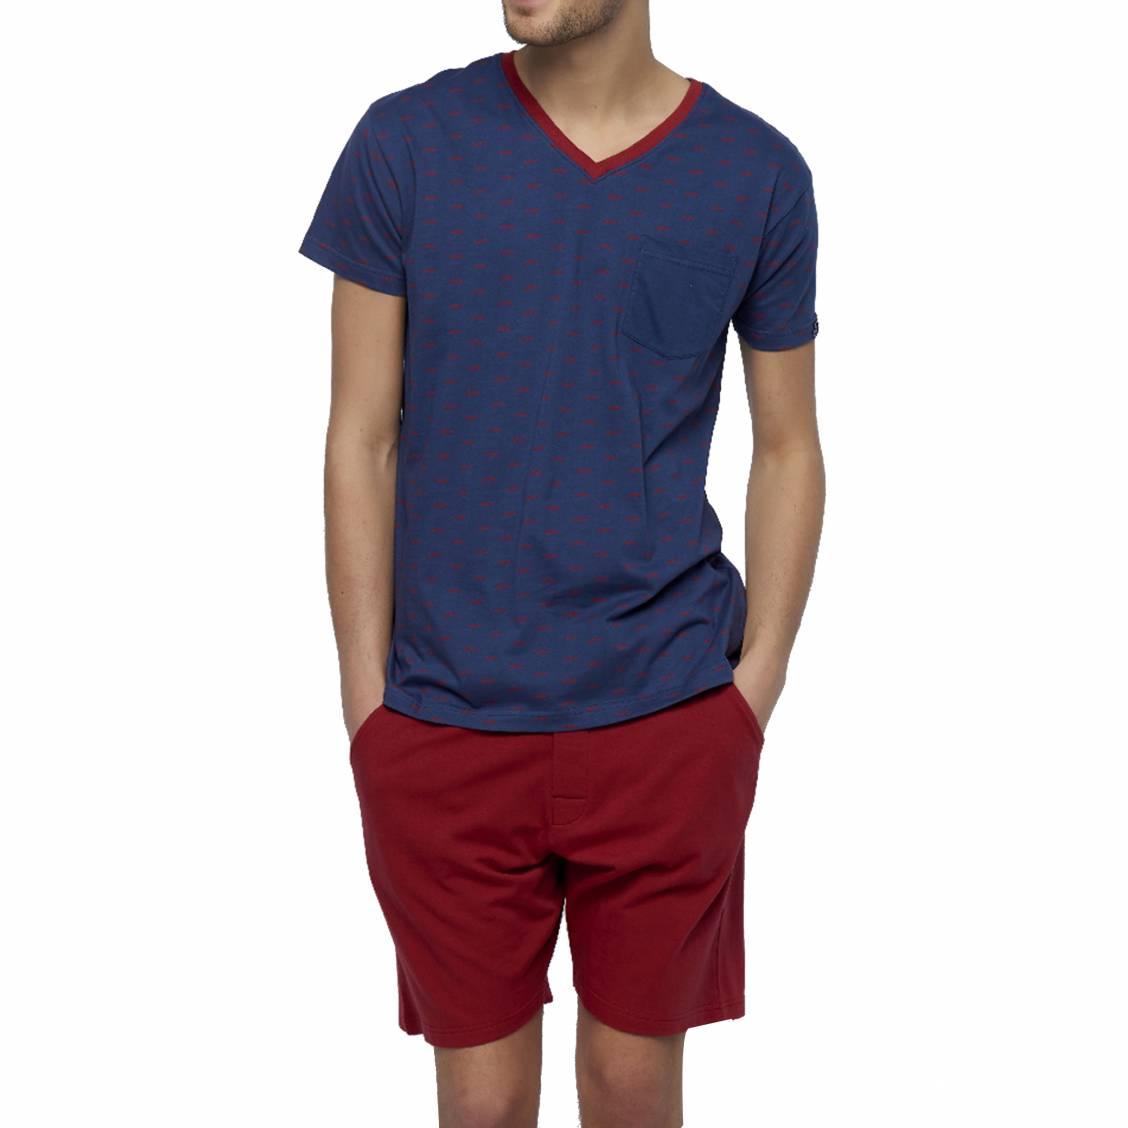 Shirt Bleu Marine Pyjama Tee Court En Arthur Dandy Coton À Col V ppwTnzxY